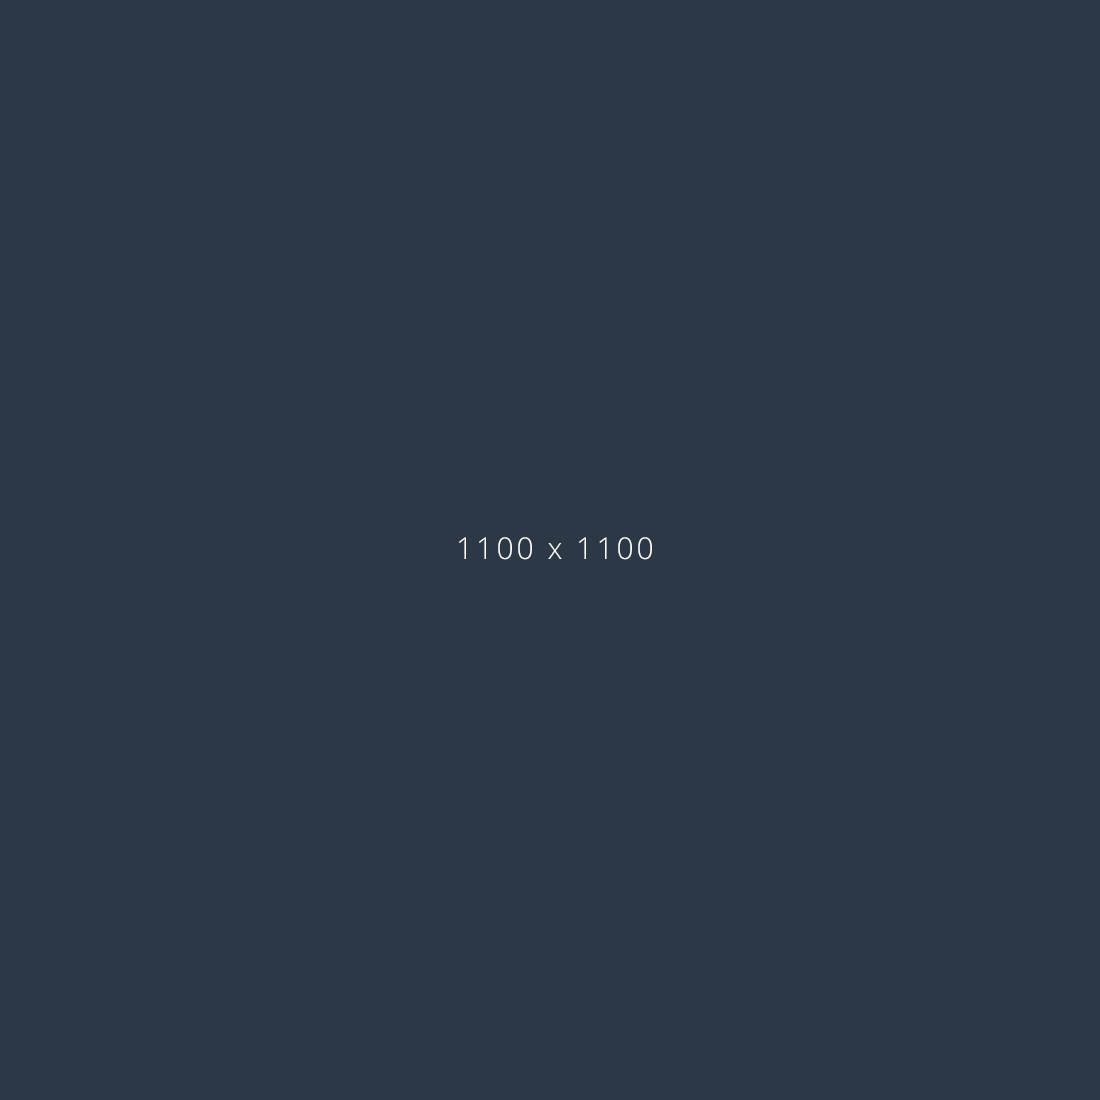 1100x1100